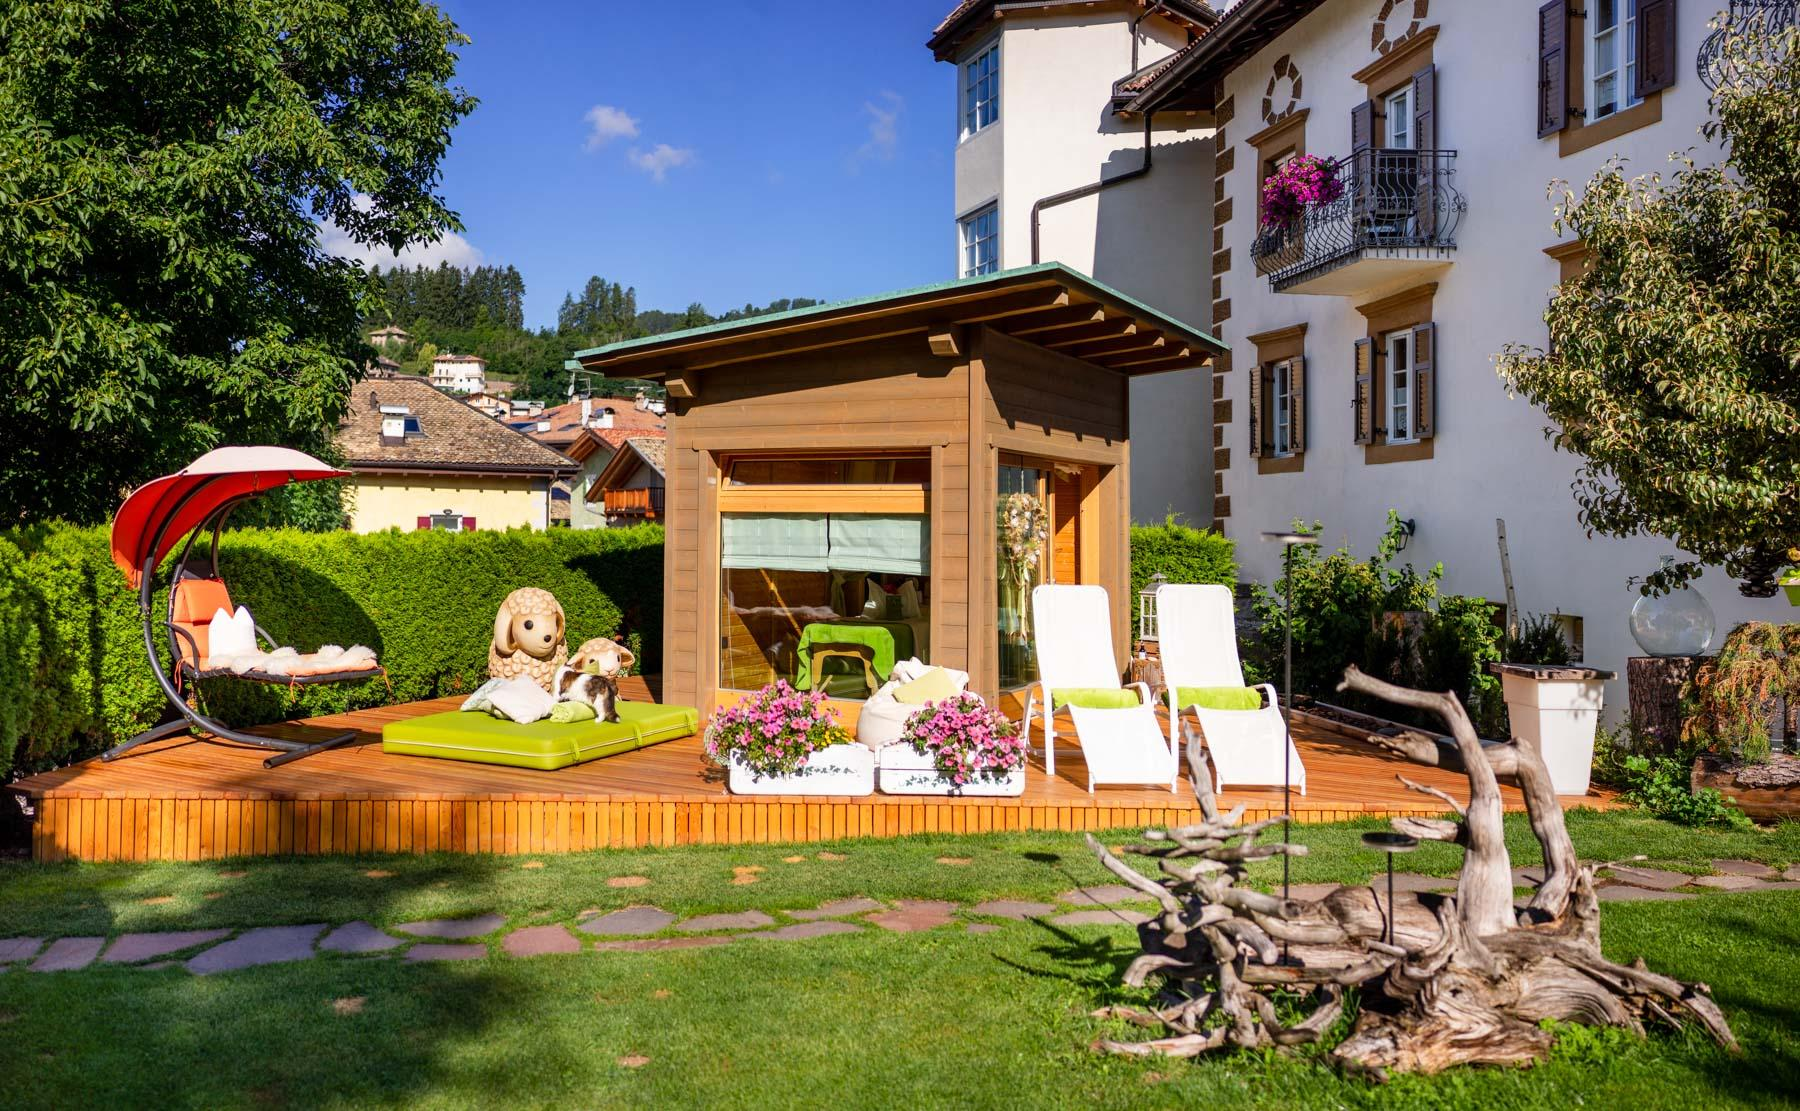 Spa cottage in the garden